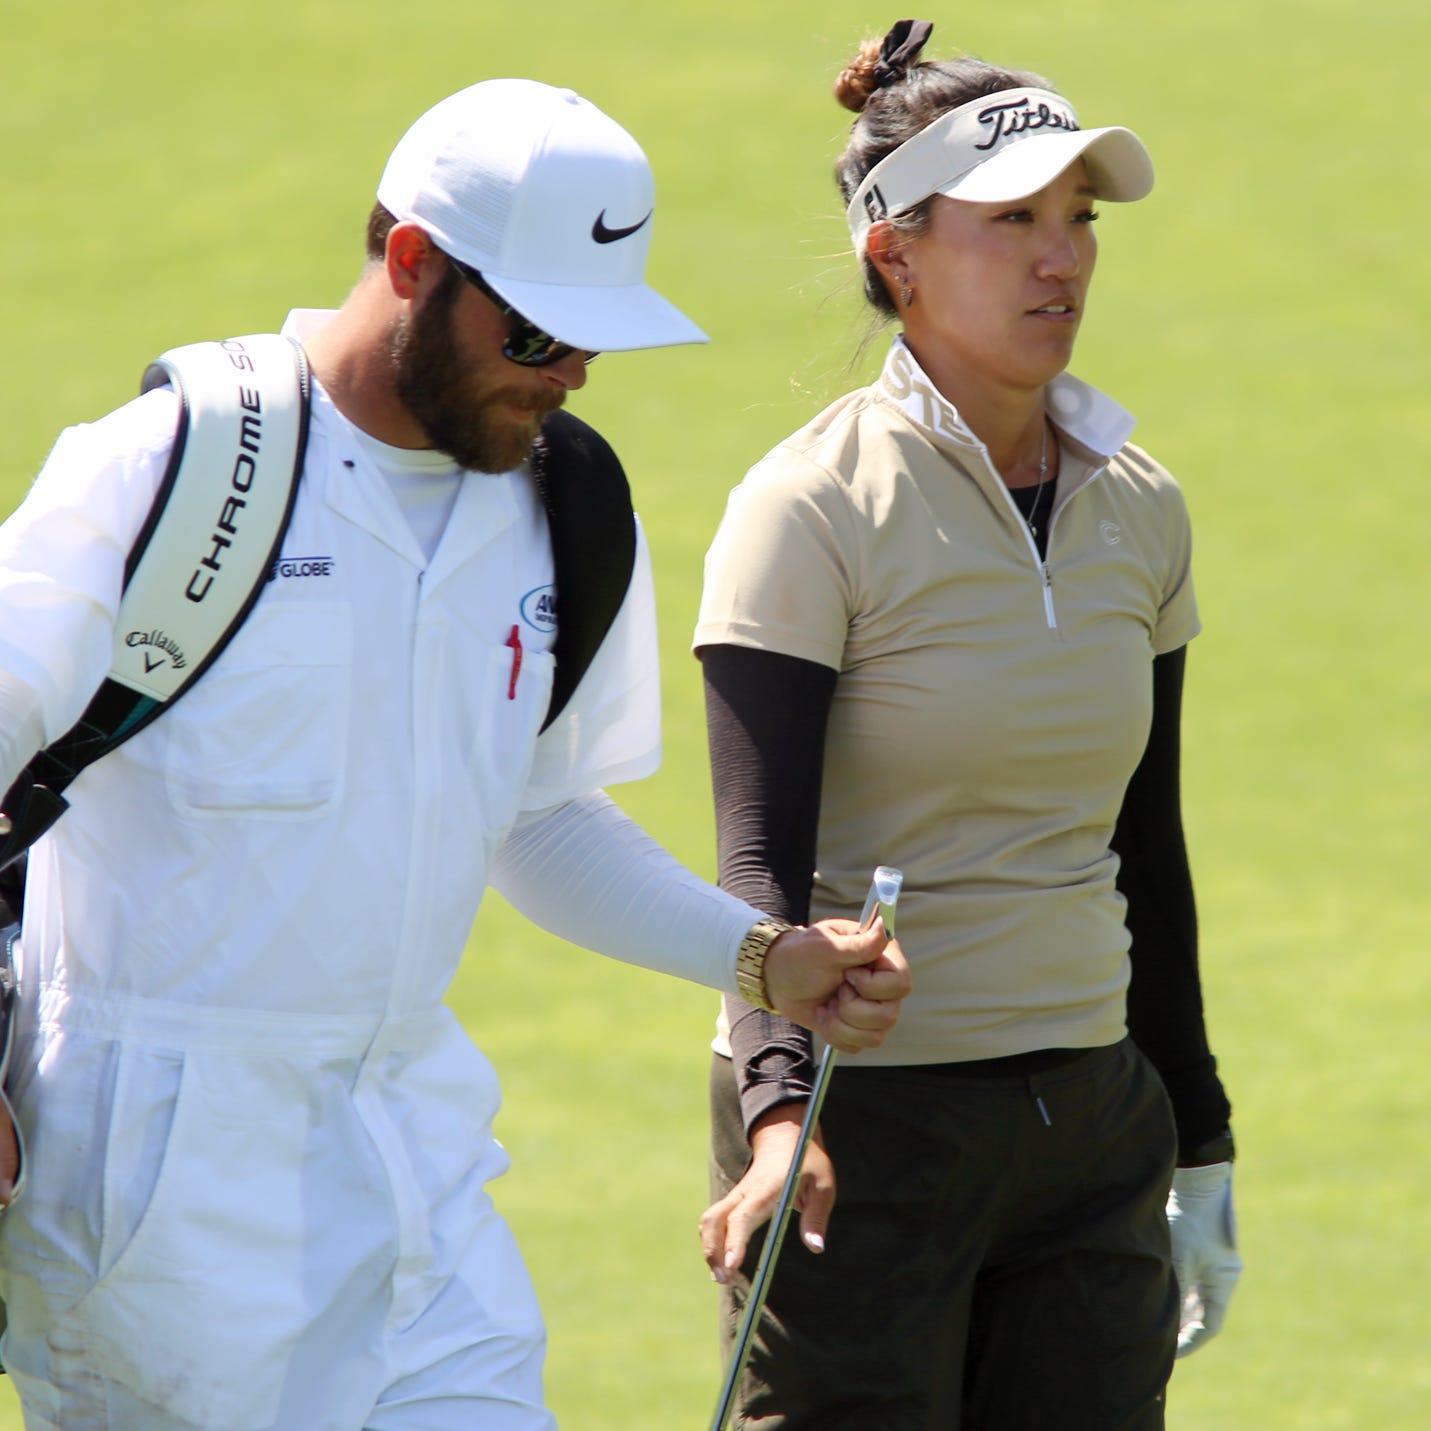 LPGA golfer misses ANA Inspiration cut with mish-mash set after her golf clubs were stolen